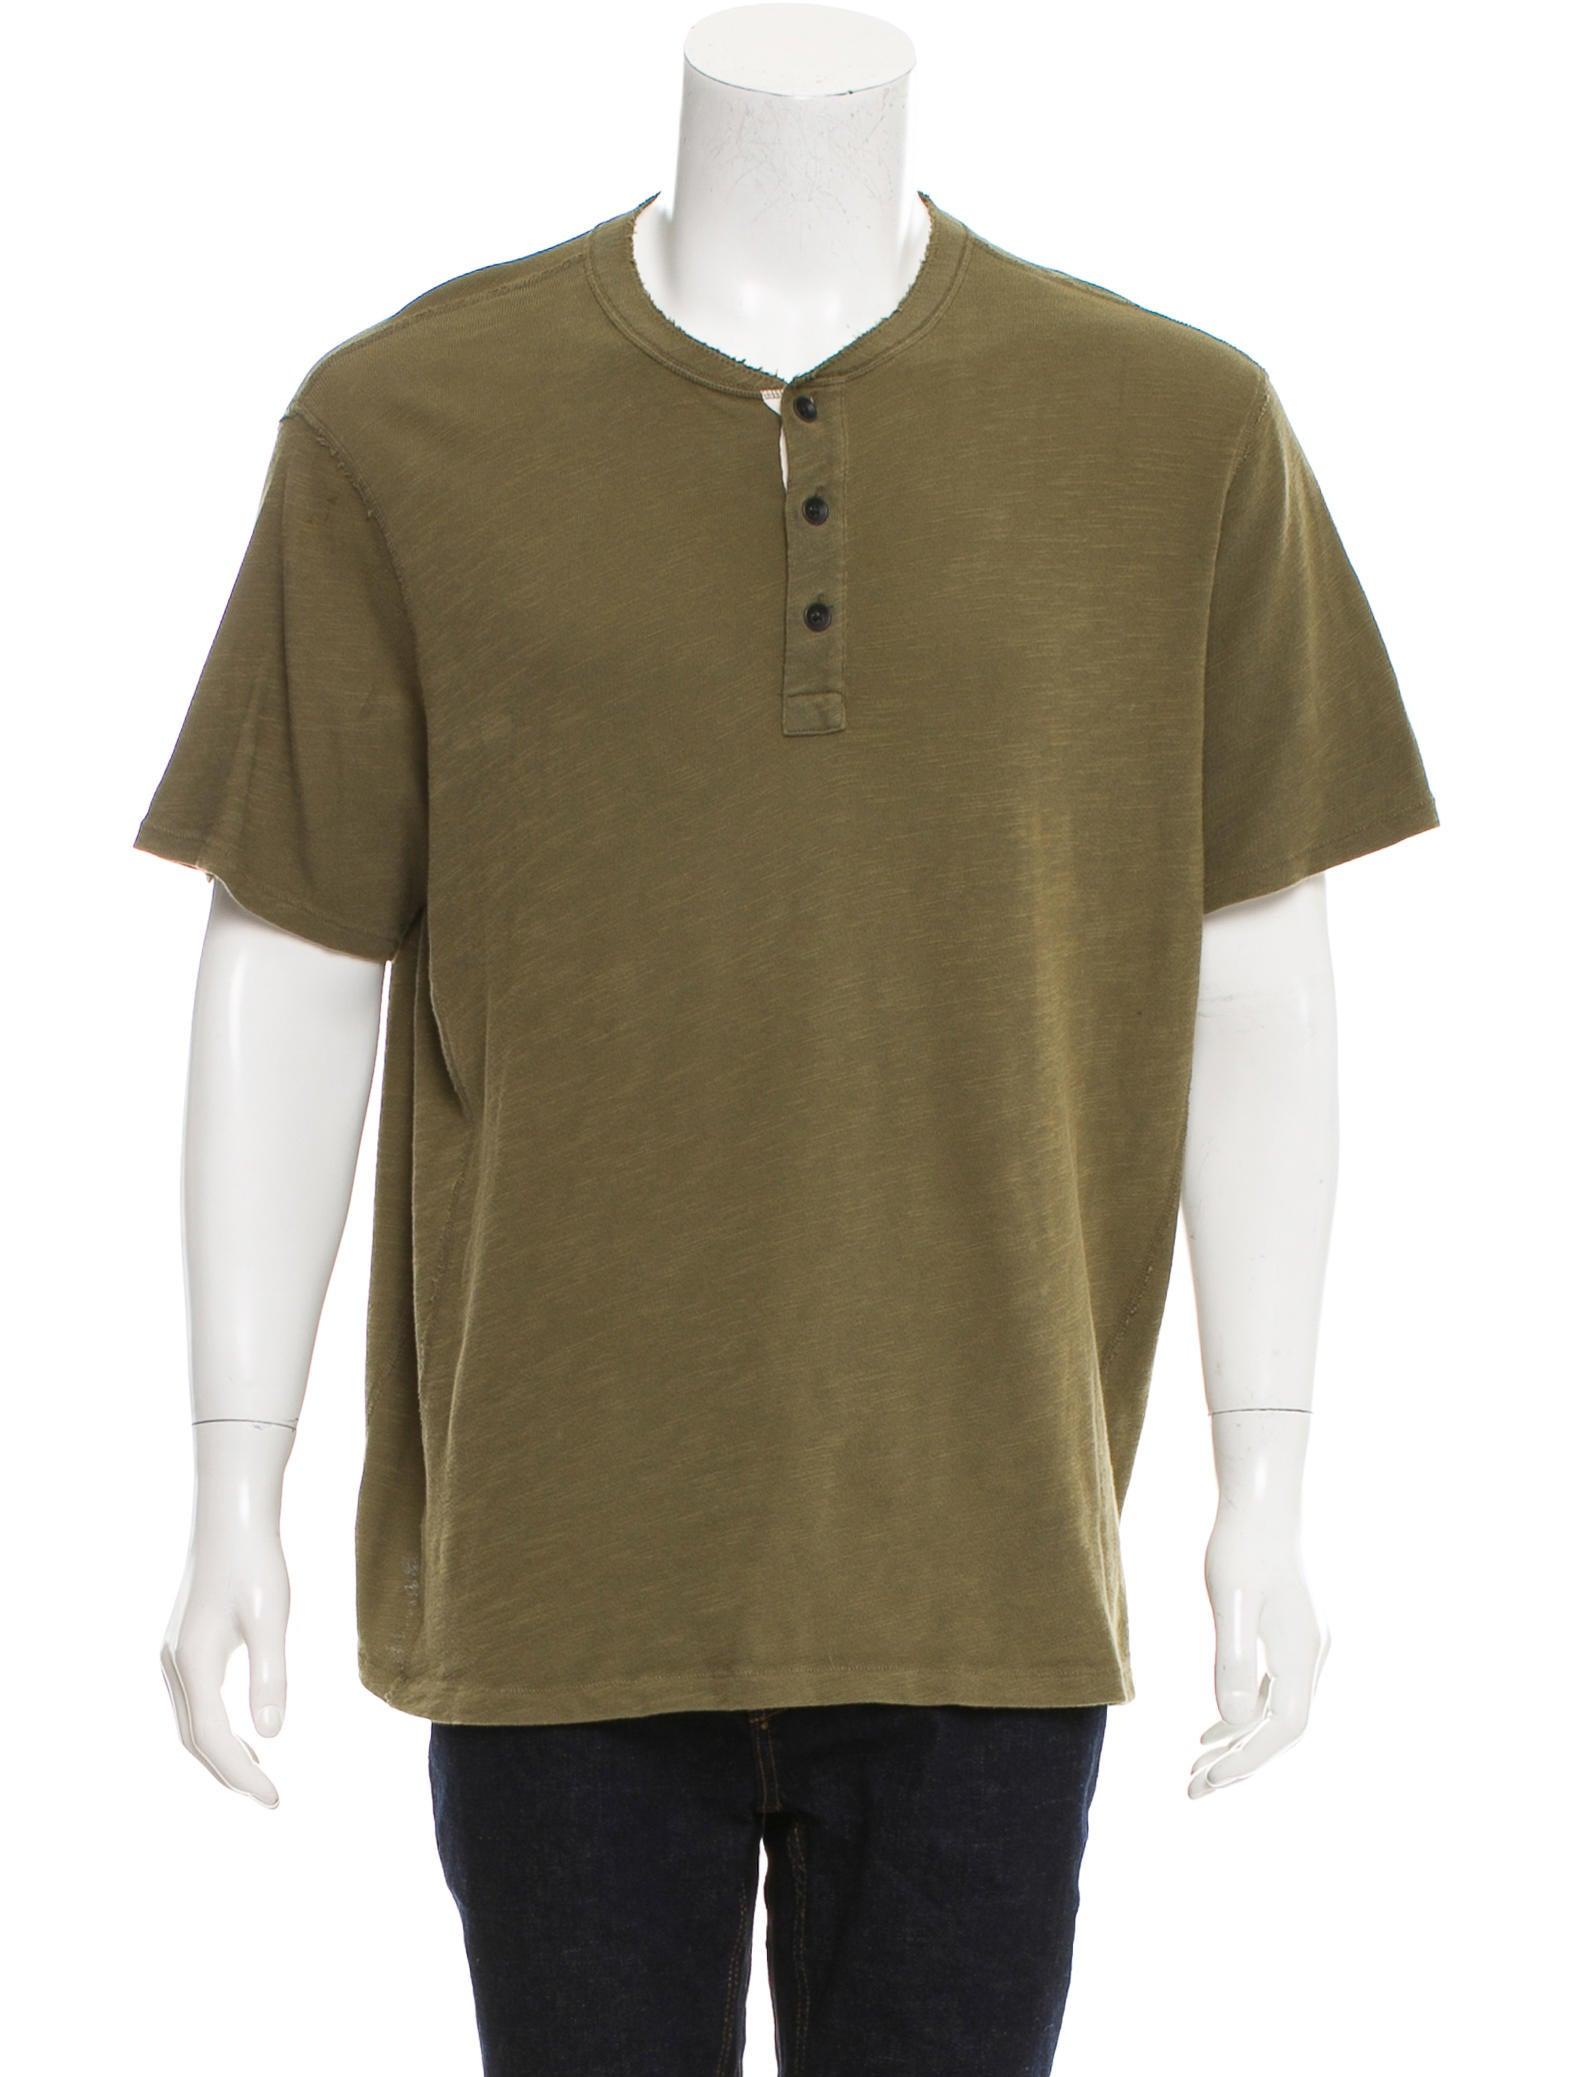 Rag bone short sleeve henley t shirt clothing for Rag and bone mens shirts sale